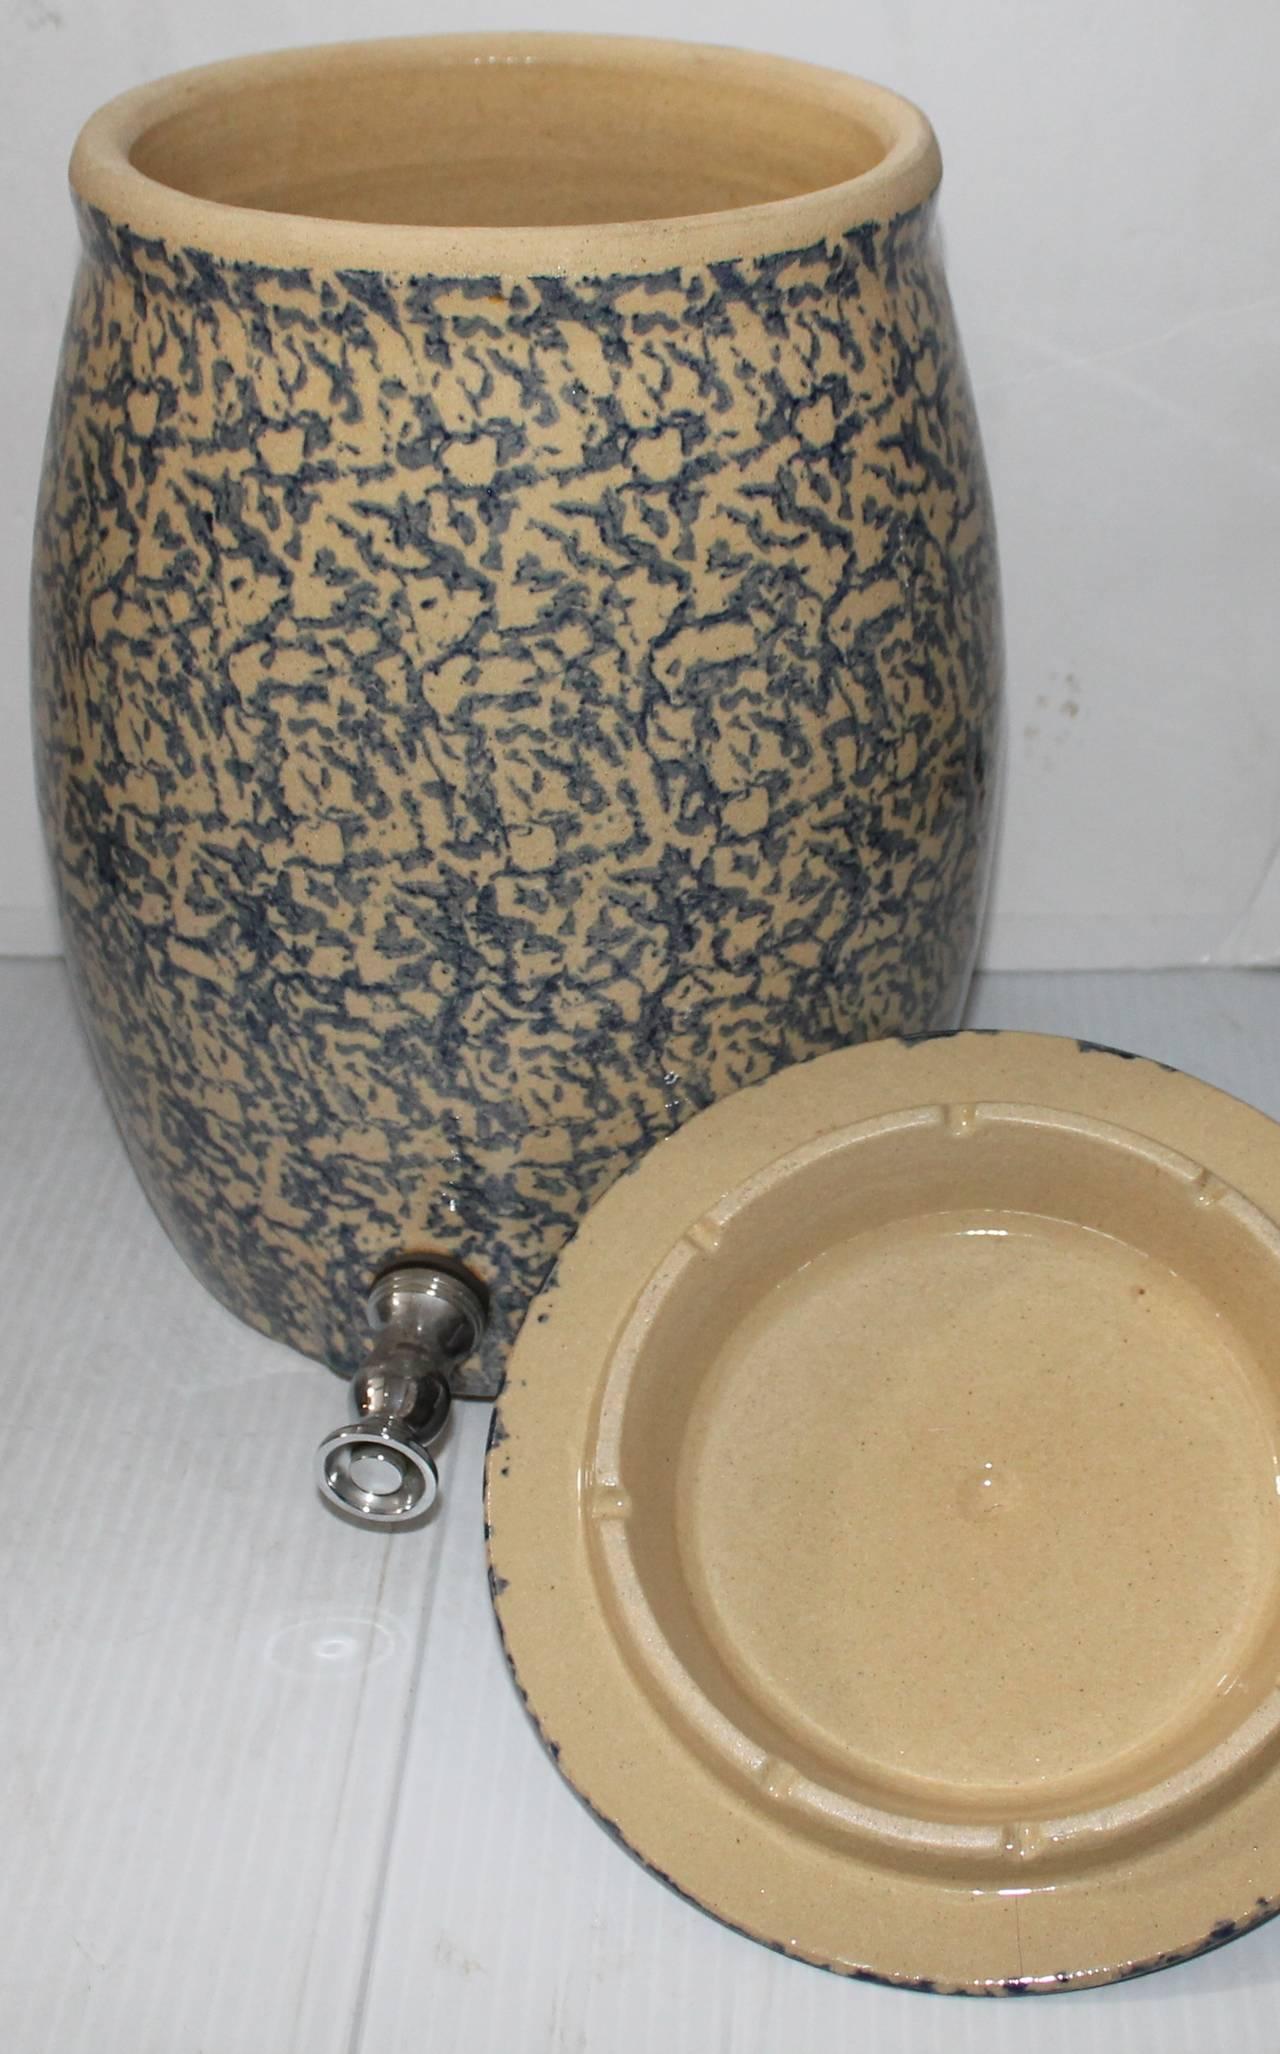 Folk Art 20th Century Ransbottom Spongeware Water Cooler For Sale